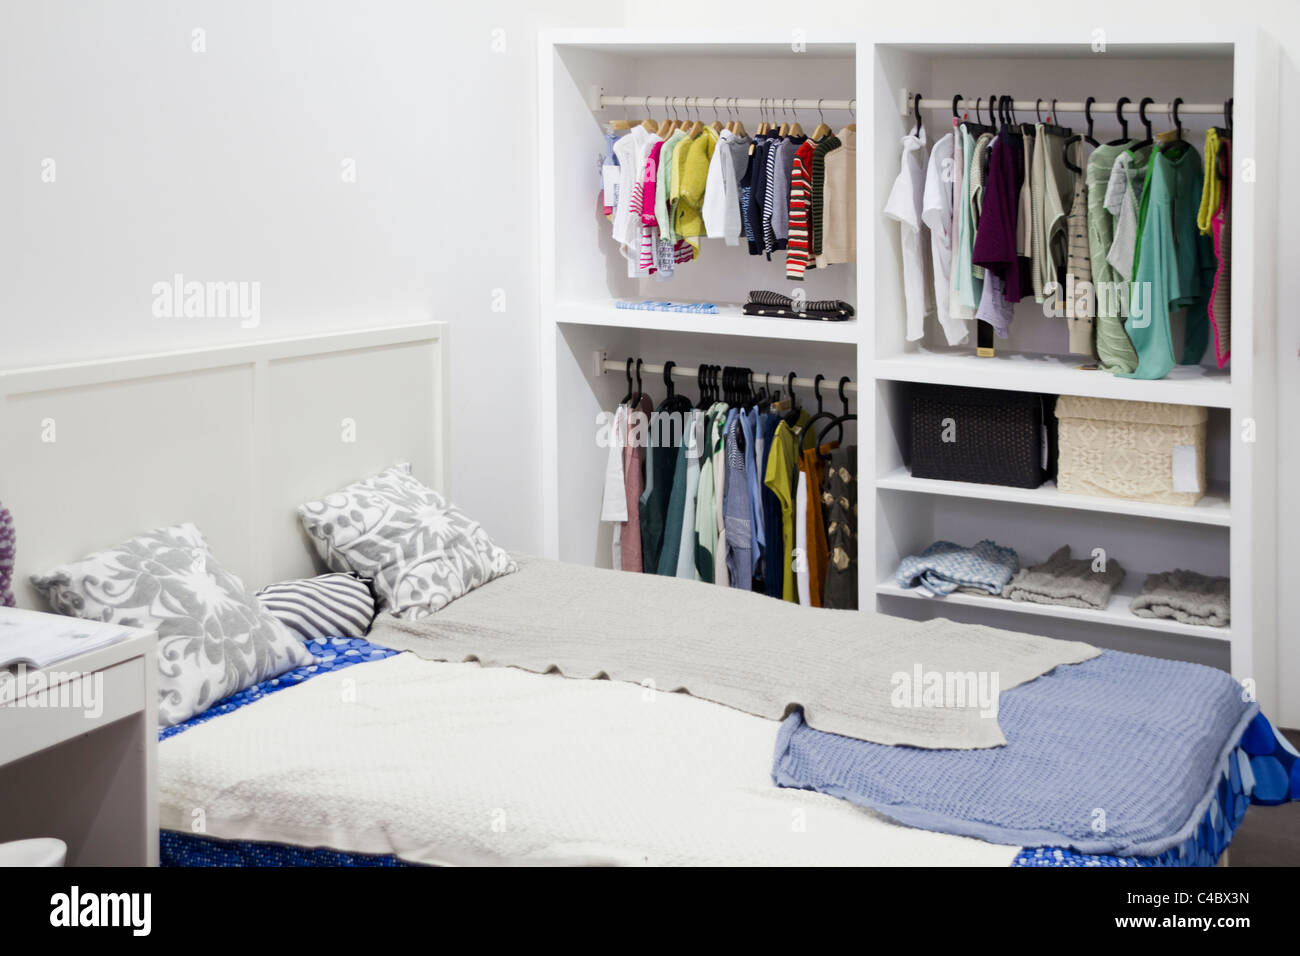 garderobe stockfotos garderobe bilder alamy. Black Bedroom Furniture Sets. Home Design Ideas